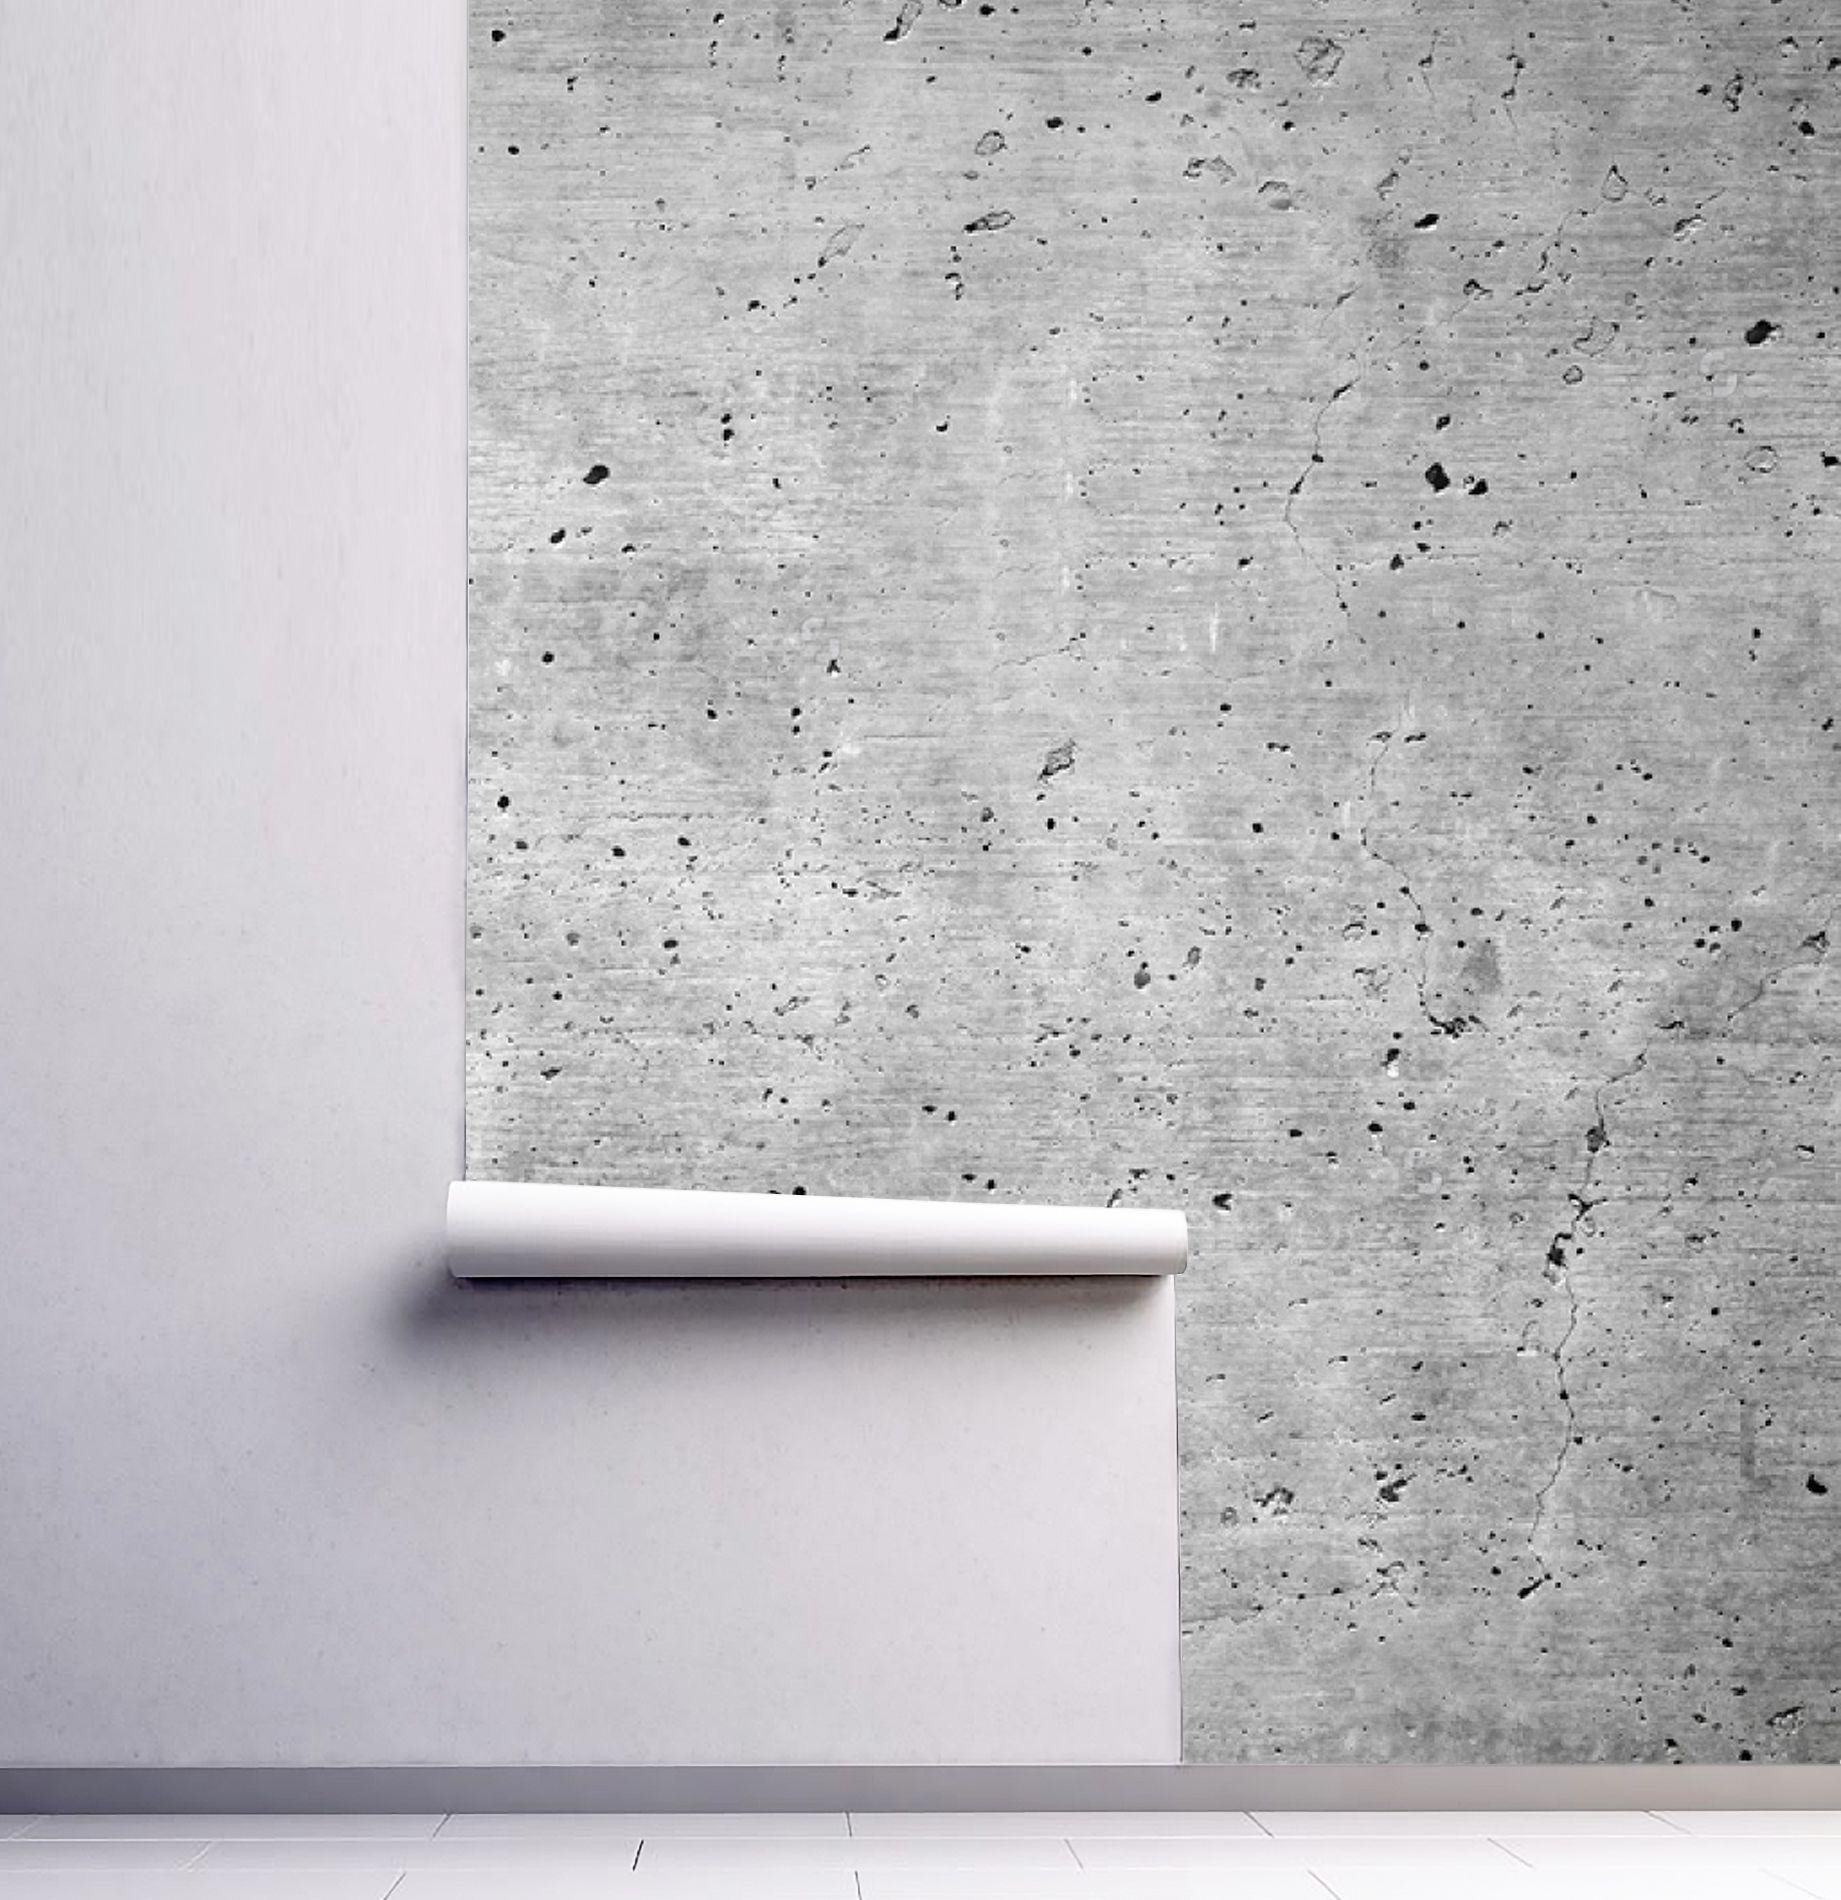 Wallpaperpeel Stickconcreteindustrialremovablebetonloft Etsy Mural Wall Murals Wall Decals